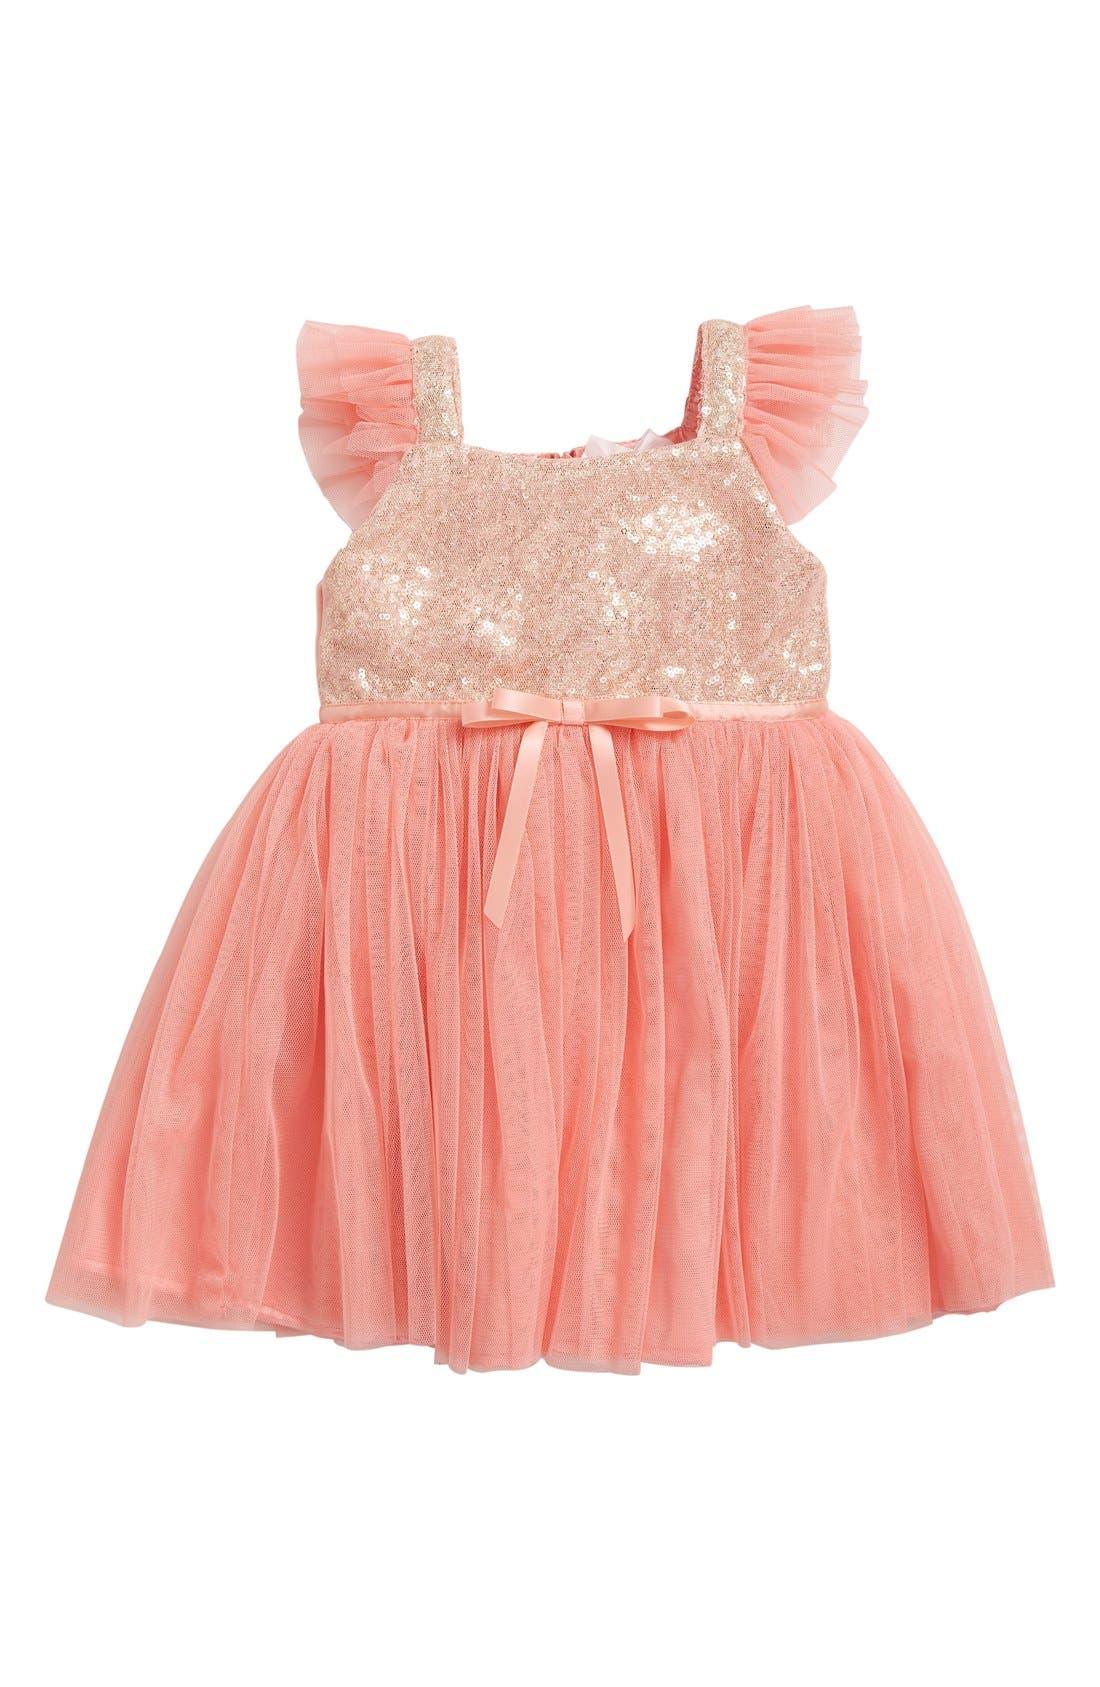 Alternate Image 1 Selected - Popatu Sequin Bodice Tulle Dress (Baby Girls)